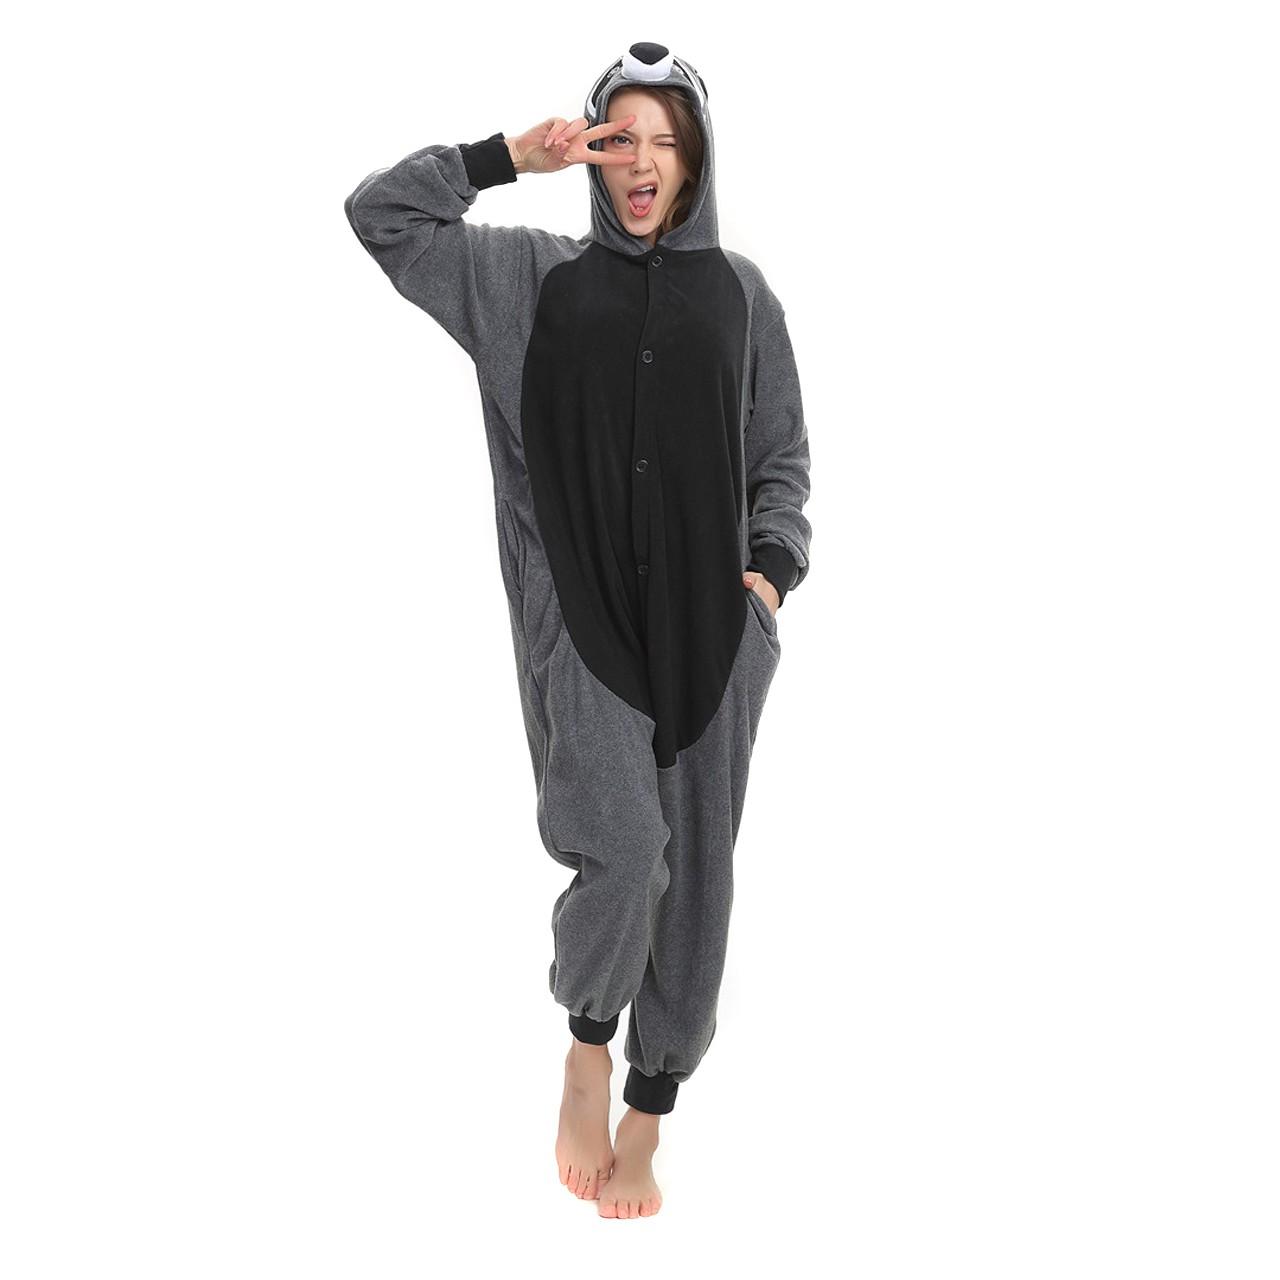 e46ae9dd5f85 Gray Panda Raccoon Onesie Animal Kigurumi Pajama Women   Men Halloween  Costumes